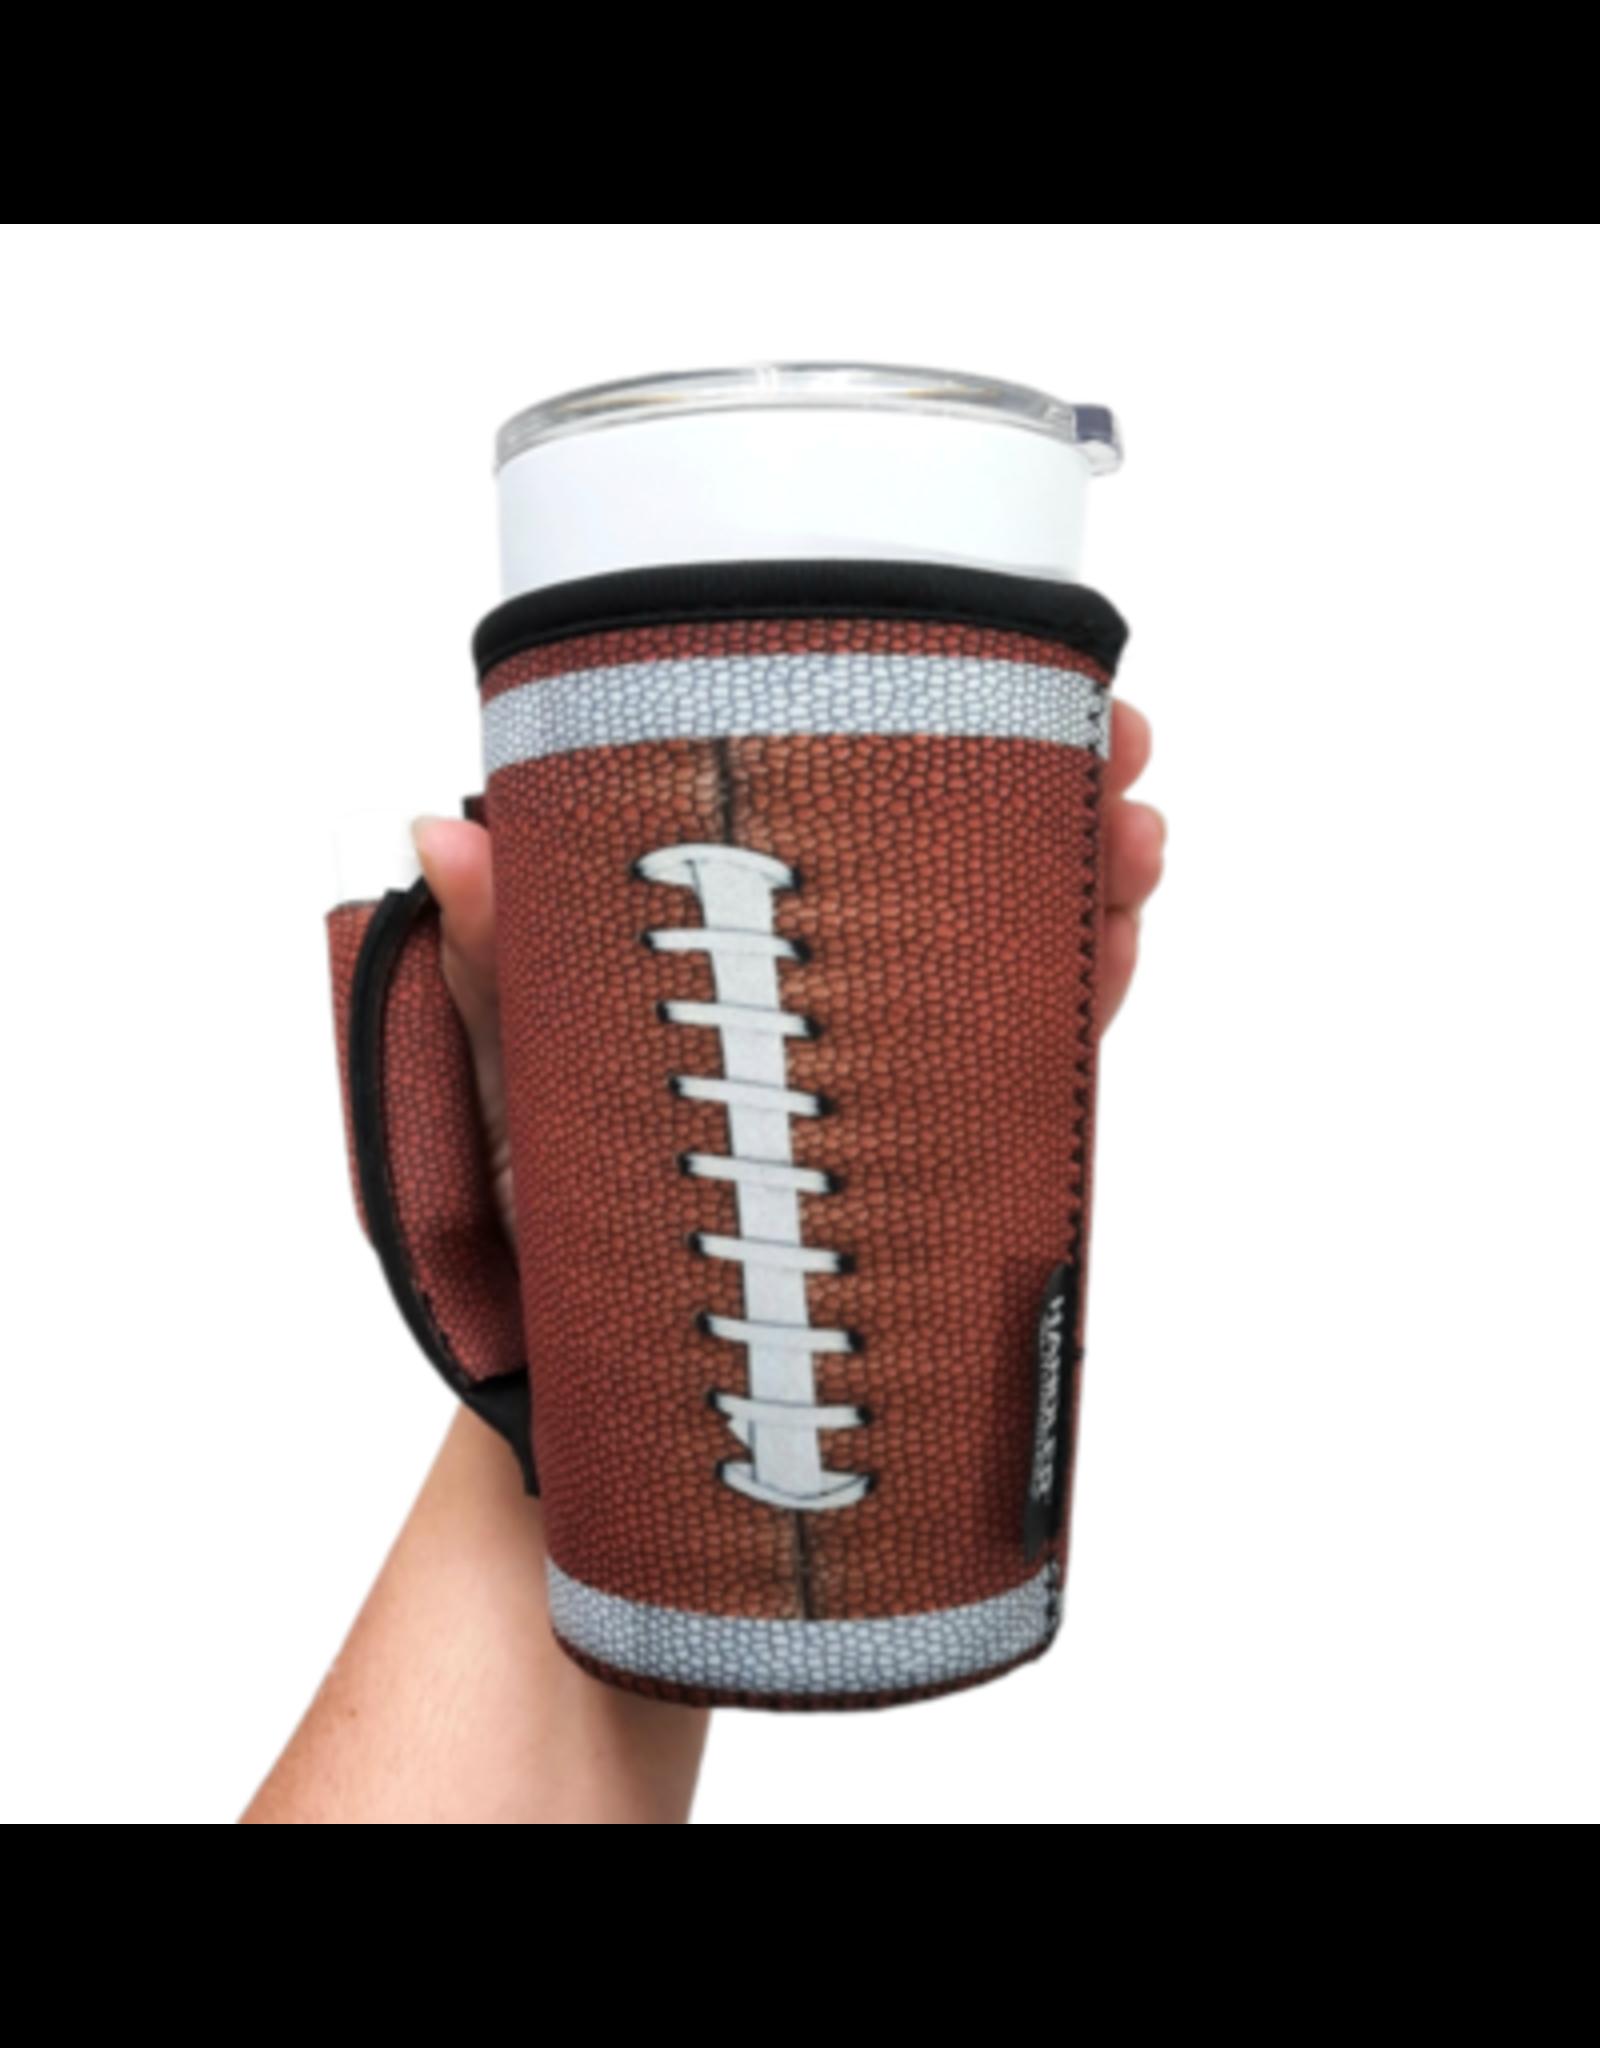 20-27 oz can pocket holder football